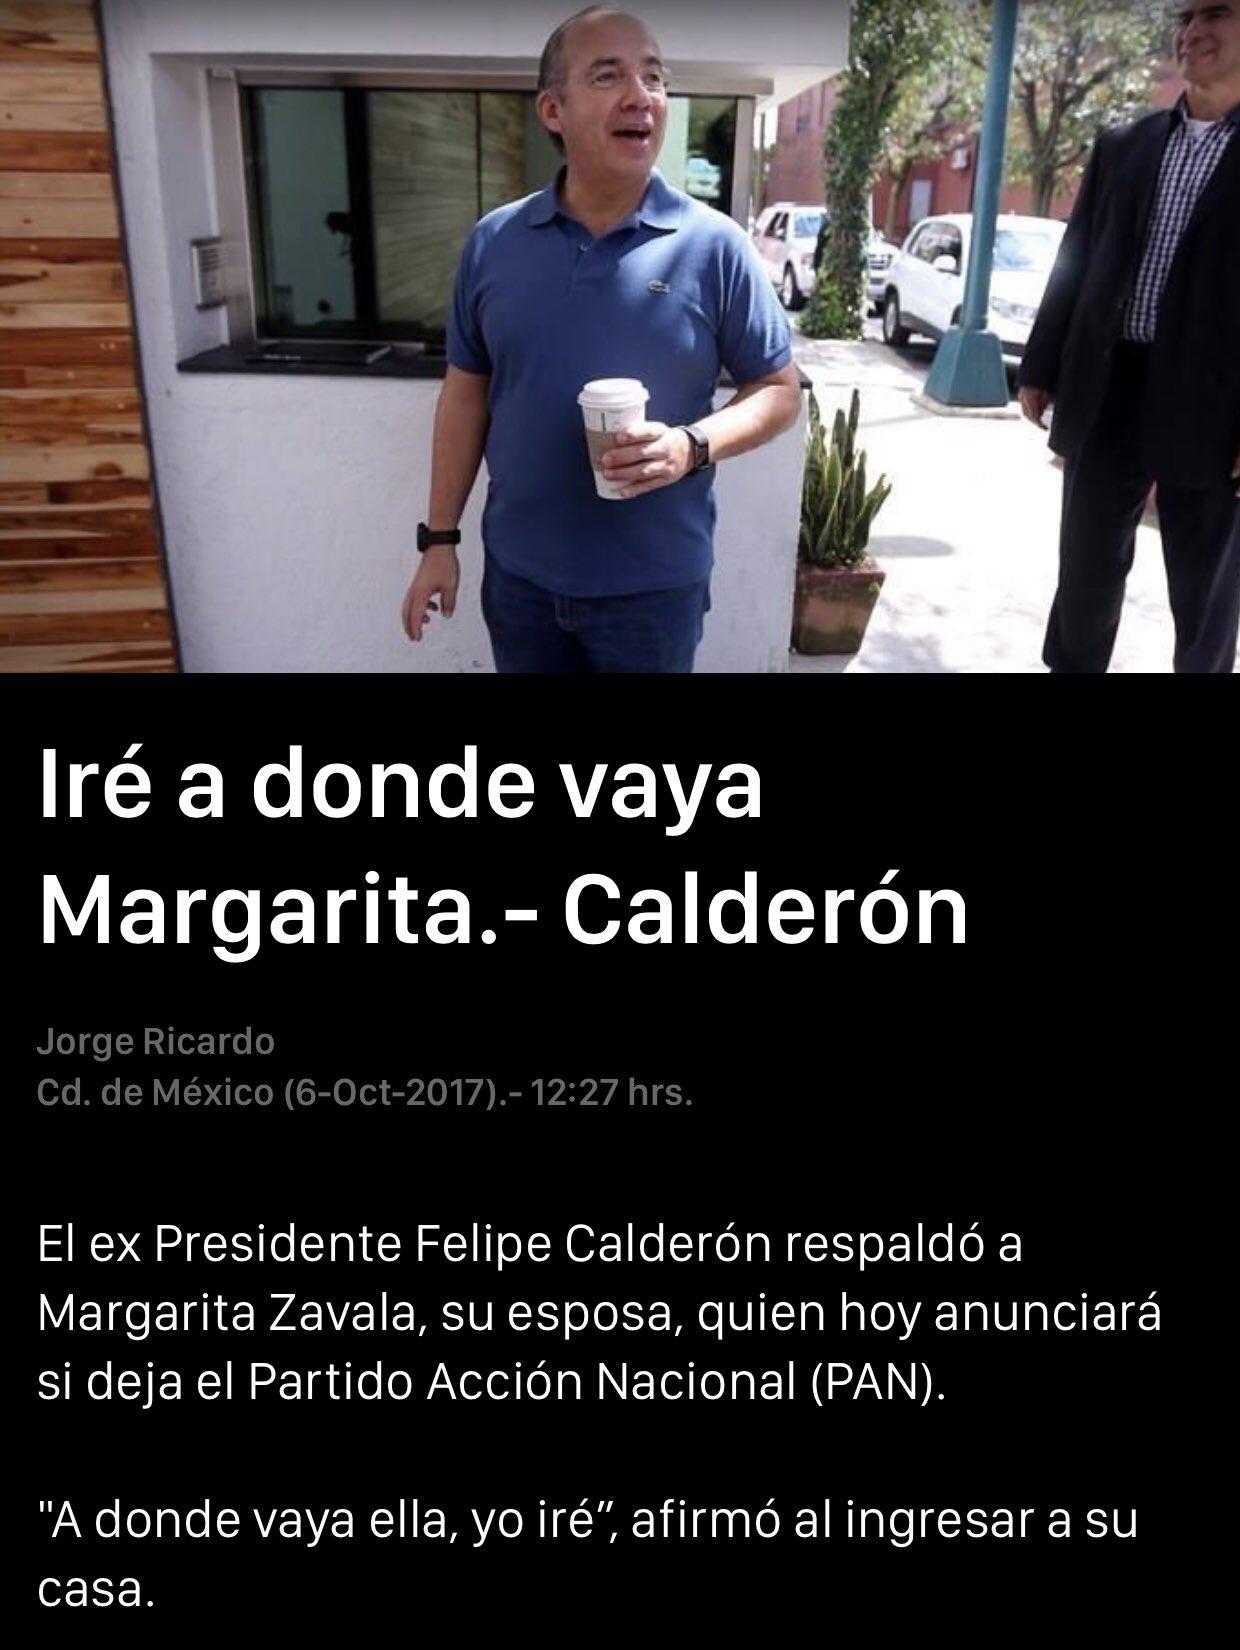 Iré a donde haya Margarita: Calderón https://t.co/QVFDTYF4iE